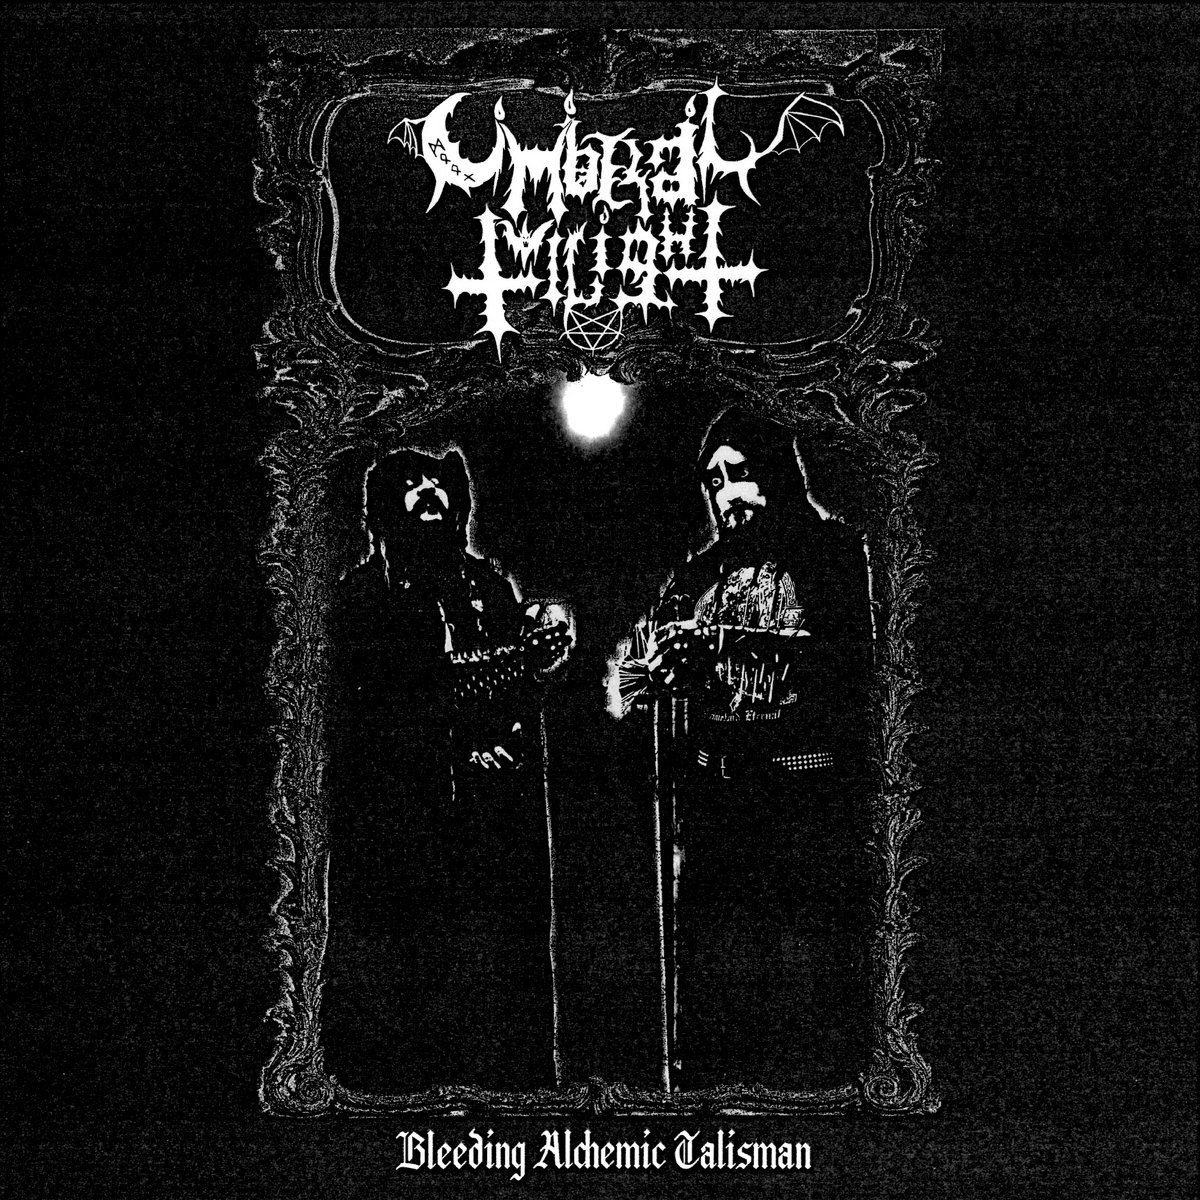 Umbral Twilight - Bleeding Alchemic Talisman